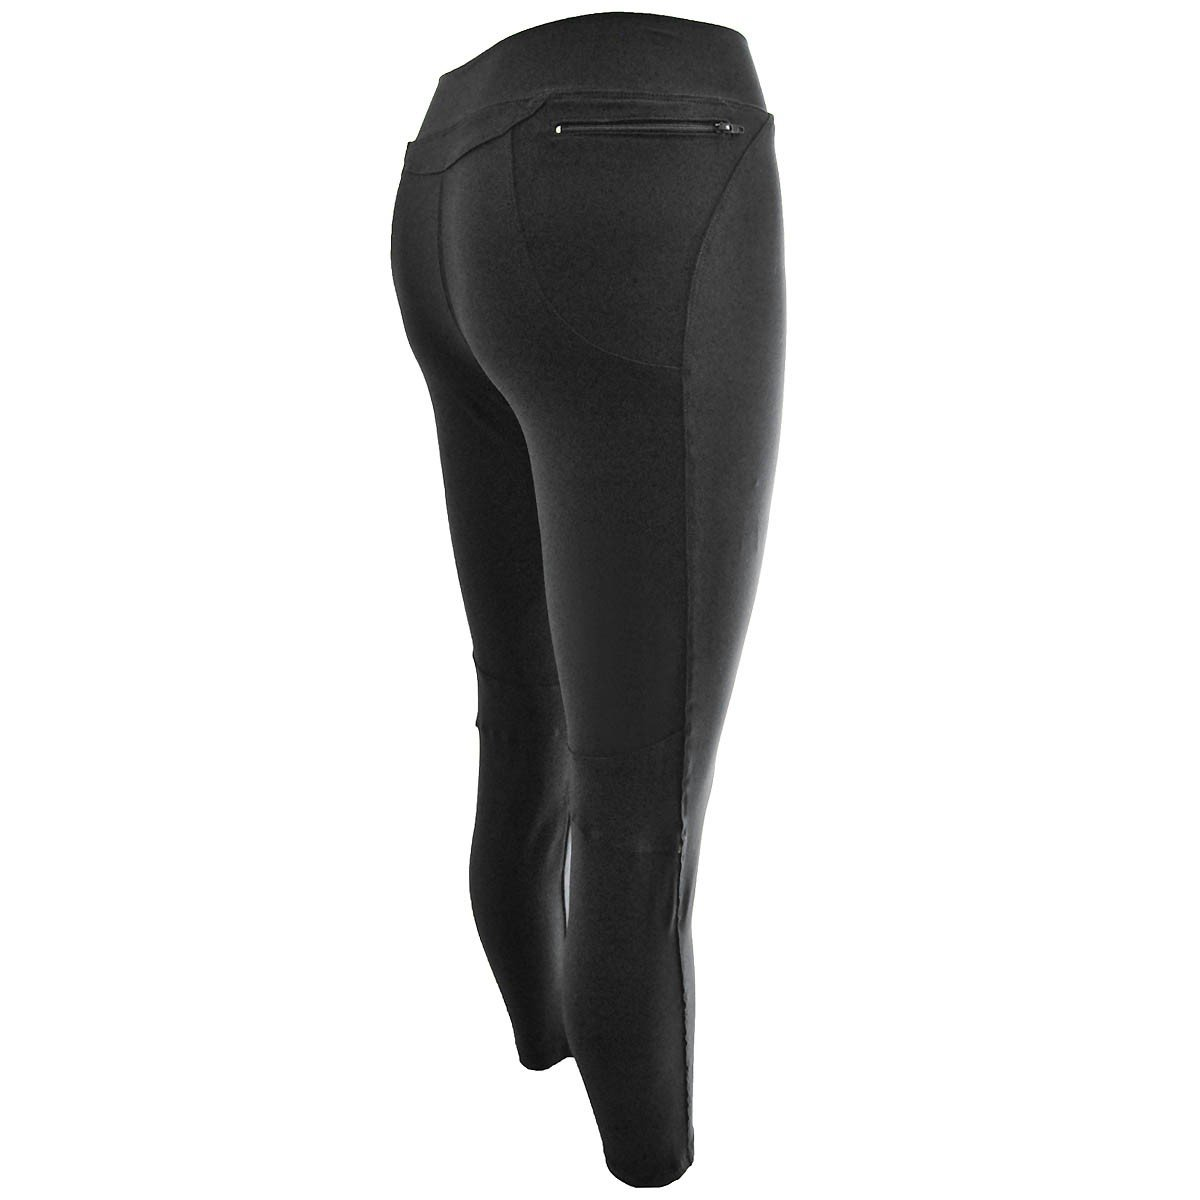 Hard Fem Preto Legging Calca Calca Bio Legging tyTq8XWq